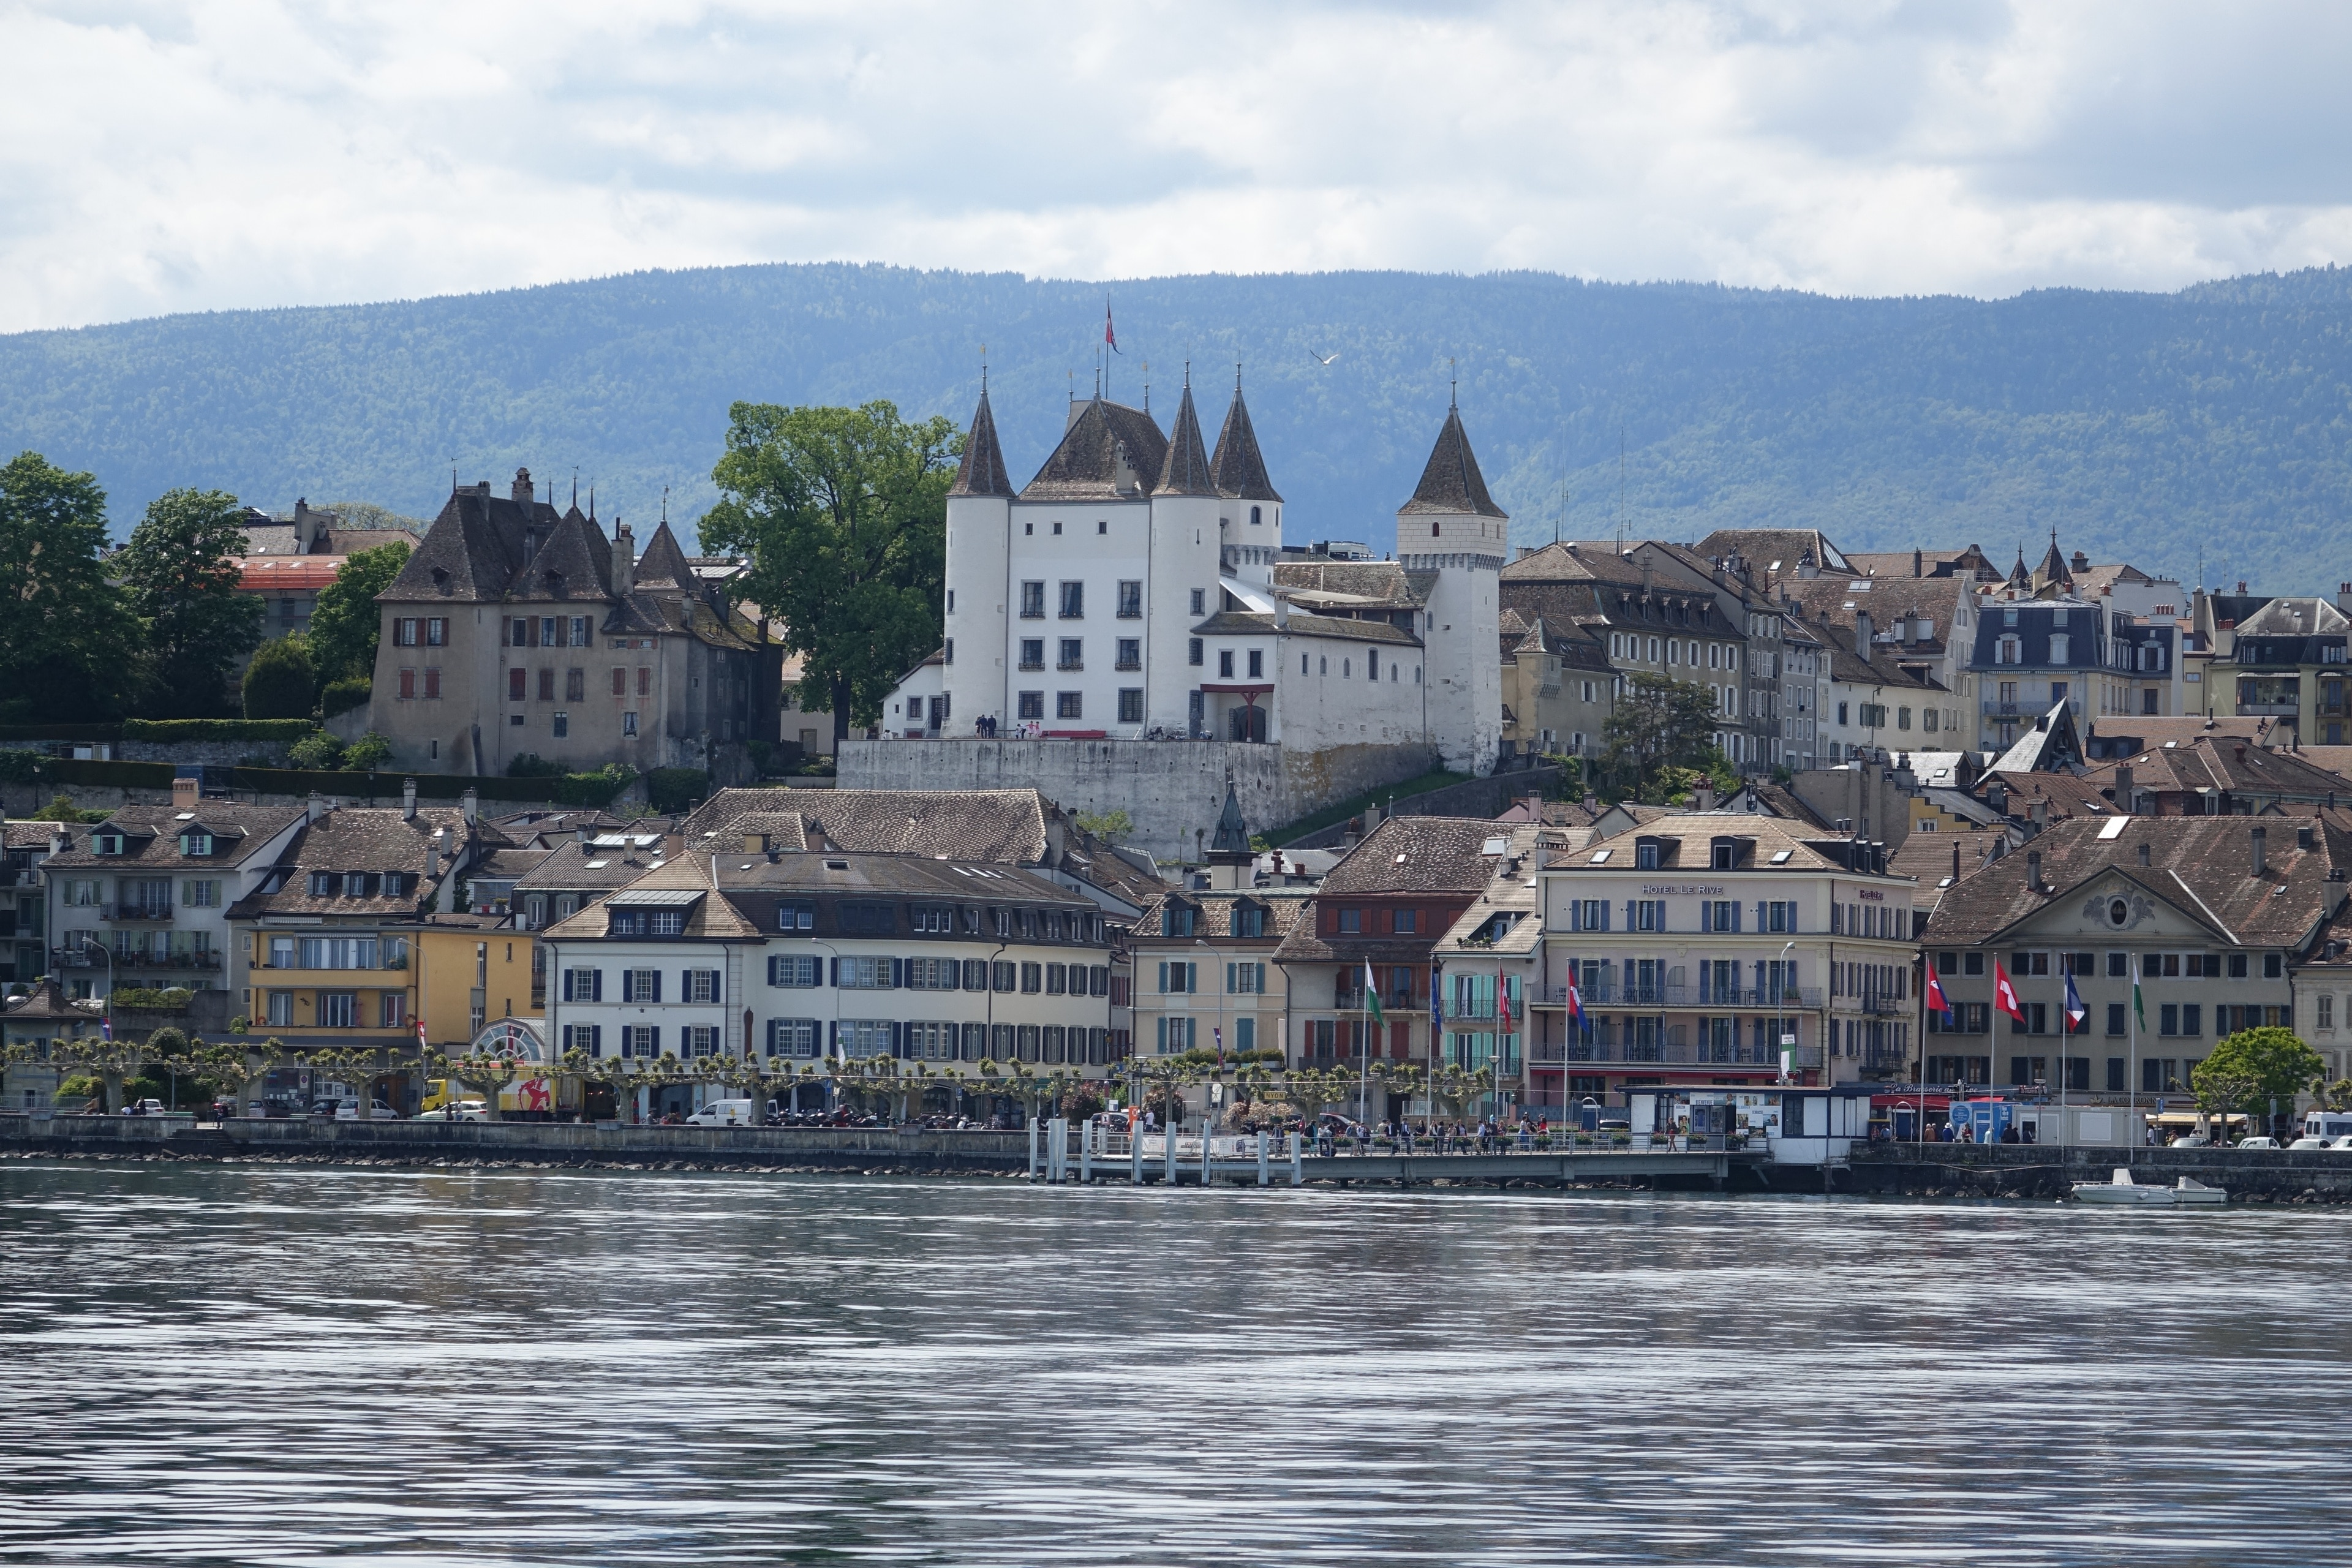 Nyon, Canton of Vaud, Switzerland